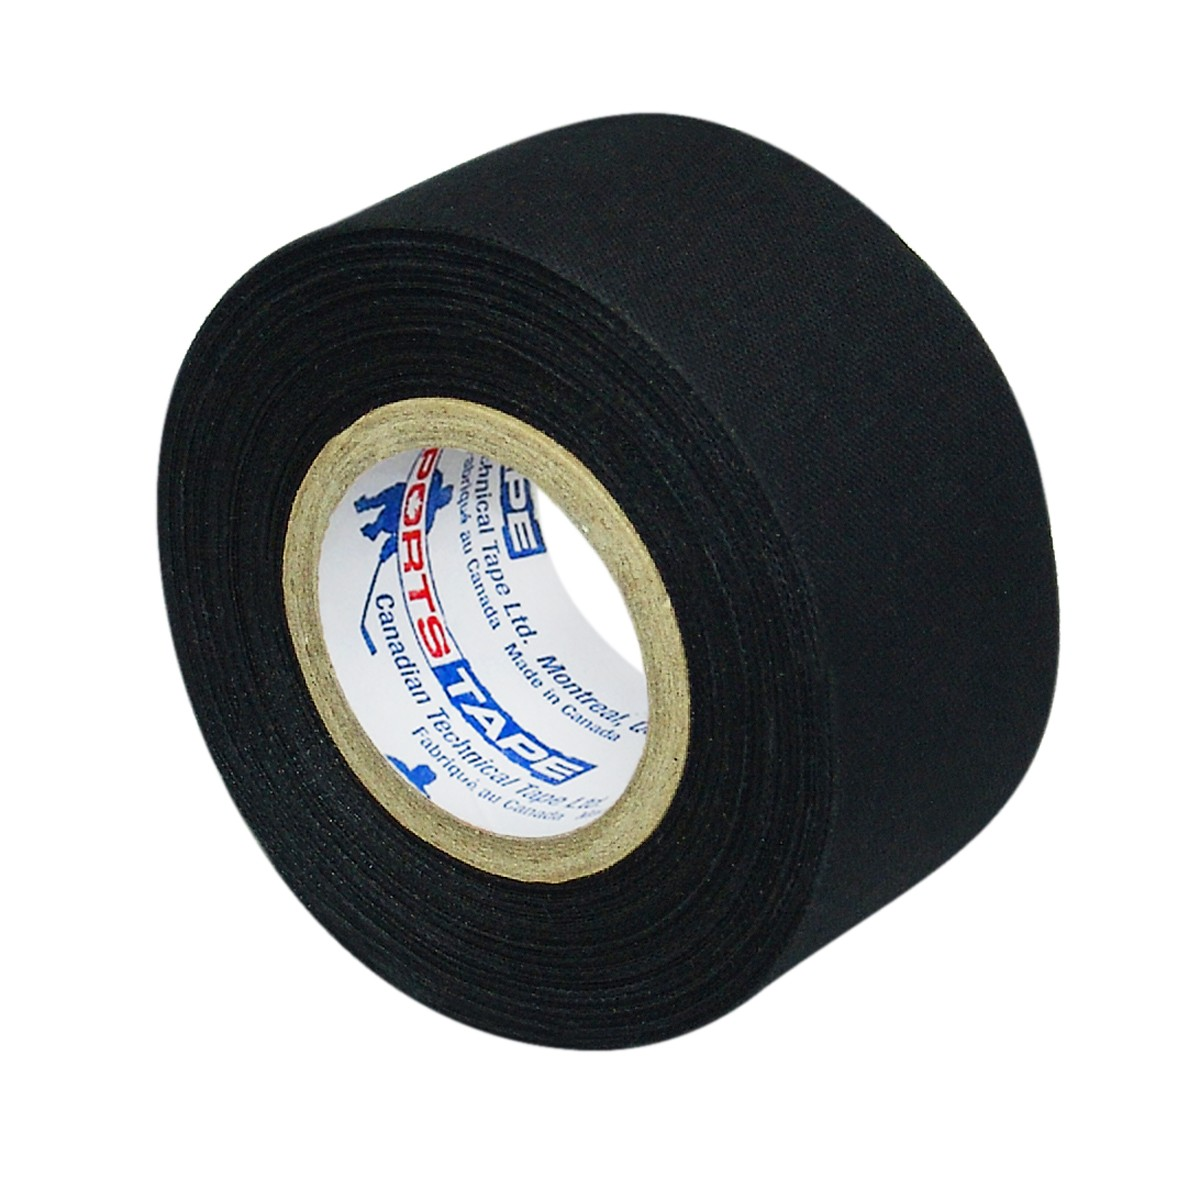 SPORTSTAPE Hockey Stick Tape 36MM X 13M